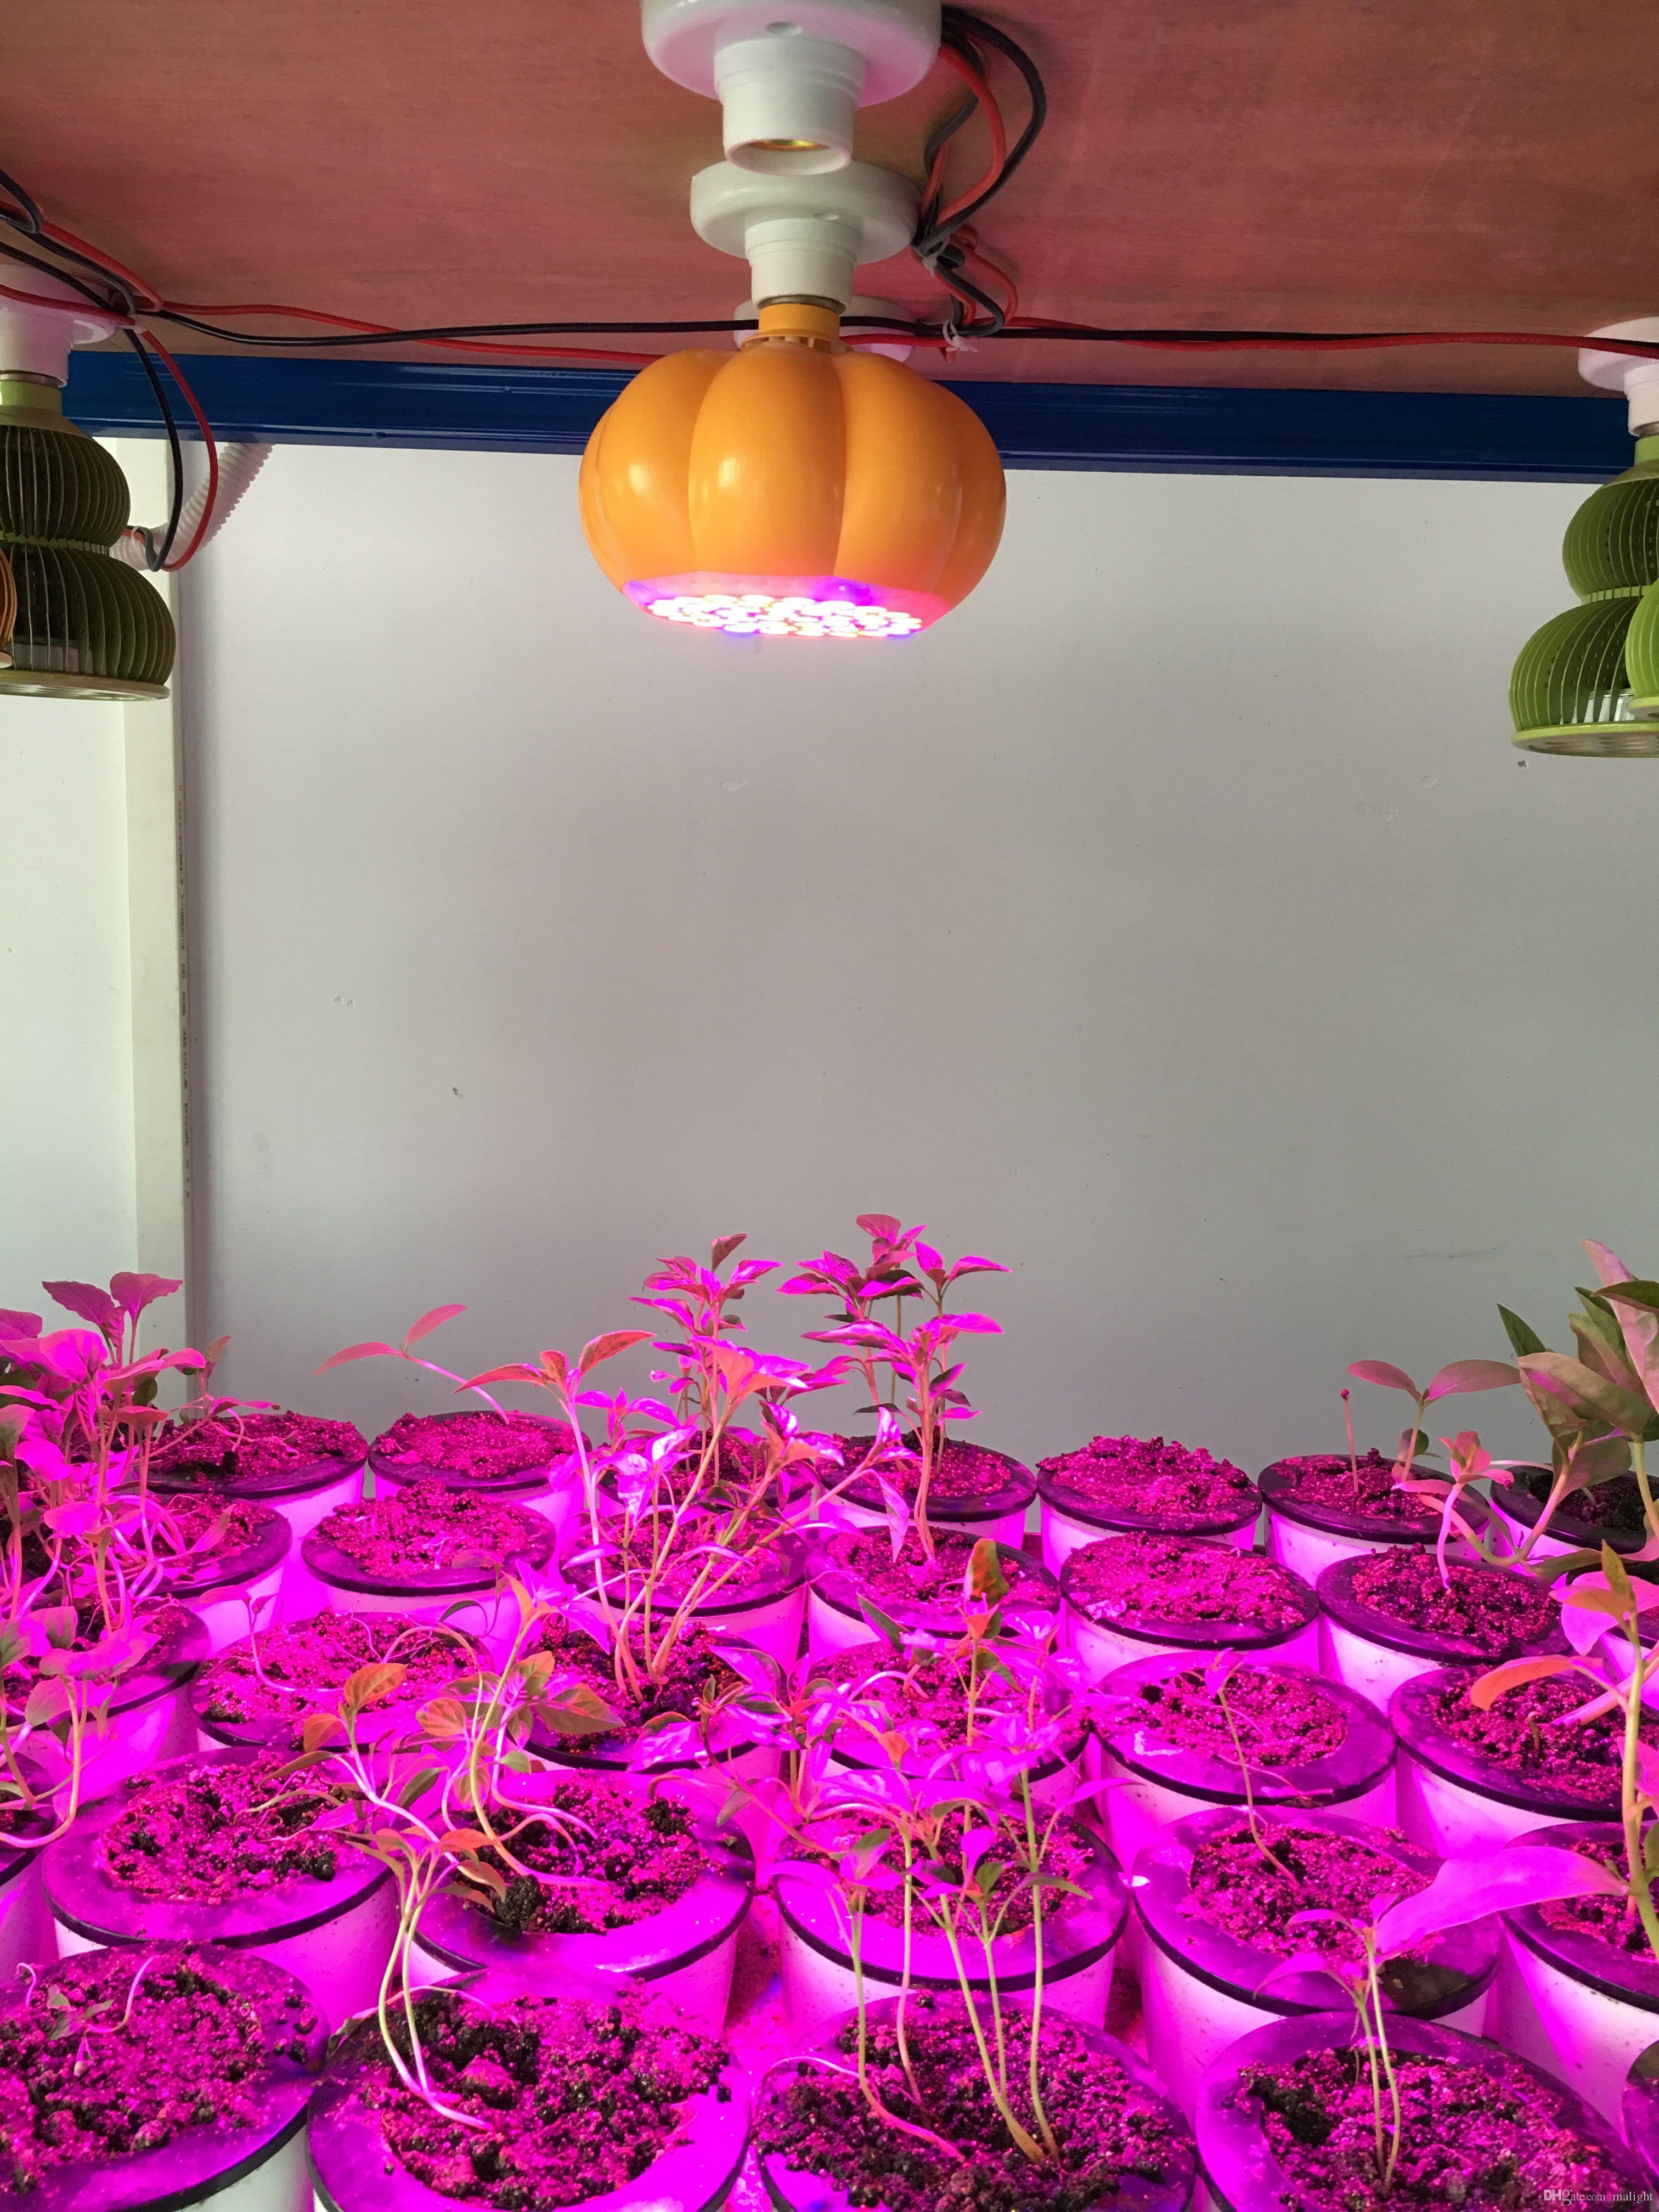 led plant grow light halloween decoration pumpkin basket plant grow light pumpkins shape hydroponic plant growing light easy to grow plants plant lighting - Growing Halloween Pumpkins